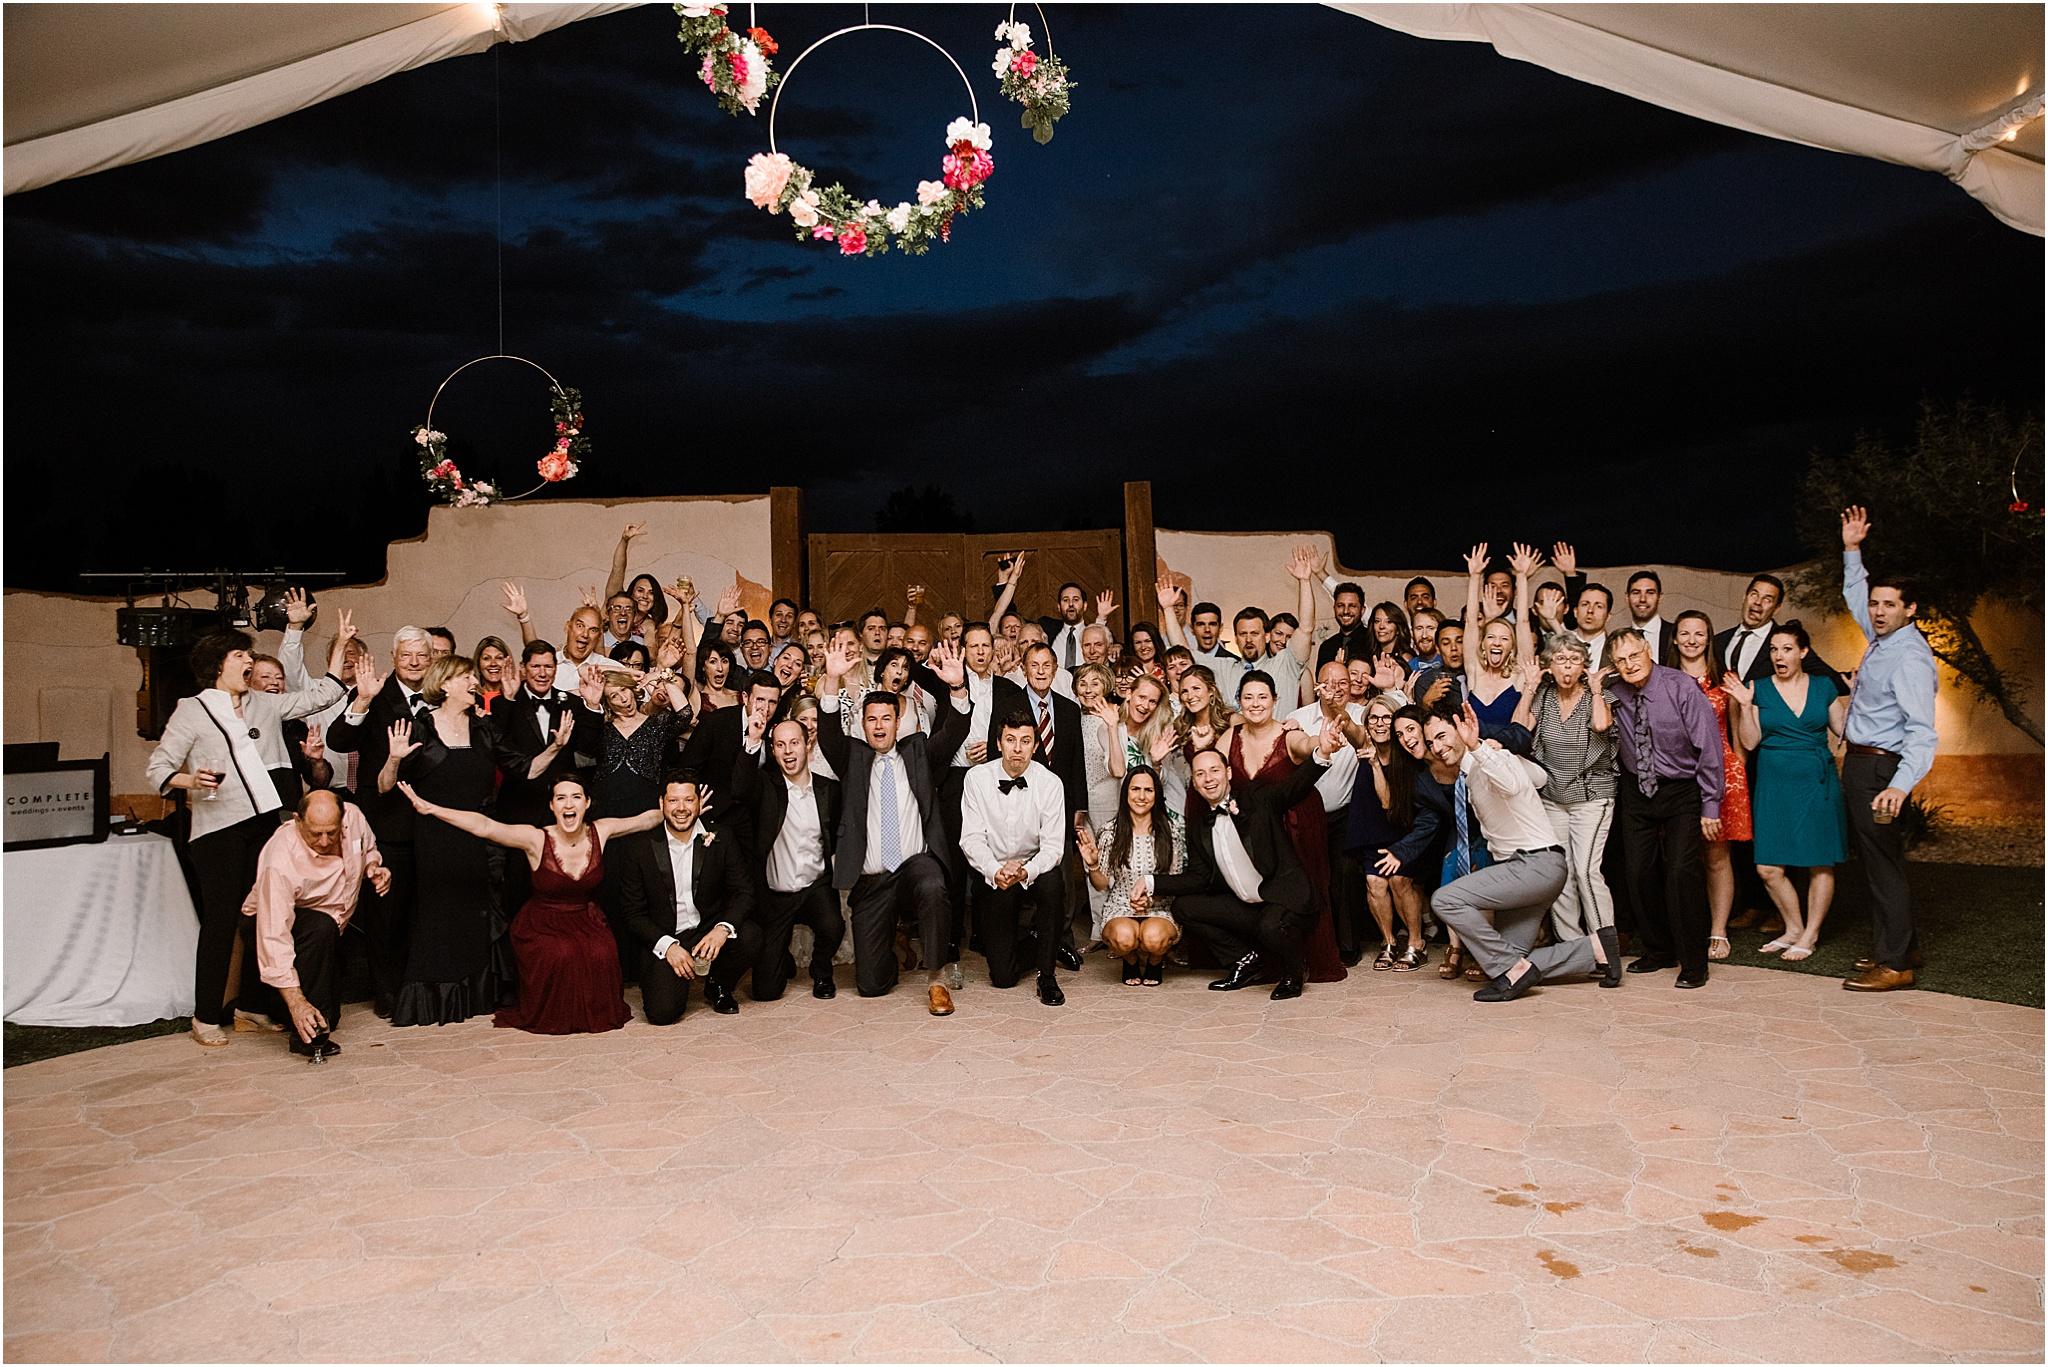 JENNA_JEROME_BLUE ROSE PHOTOGRAPHY_ABQ WEDDING_74